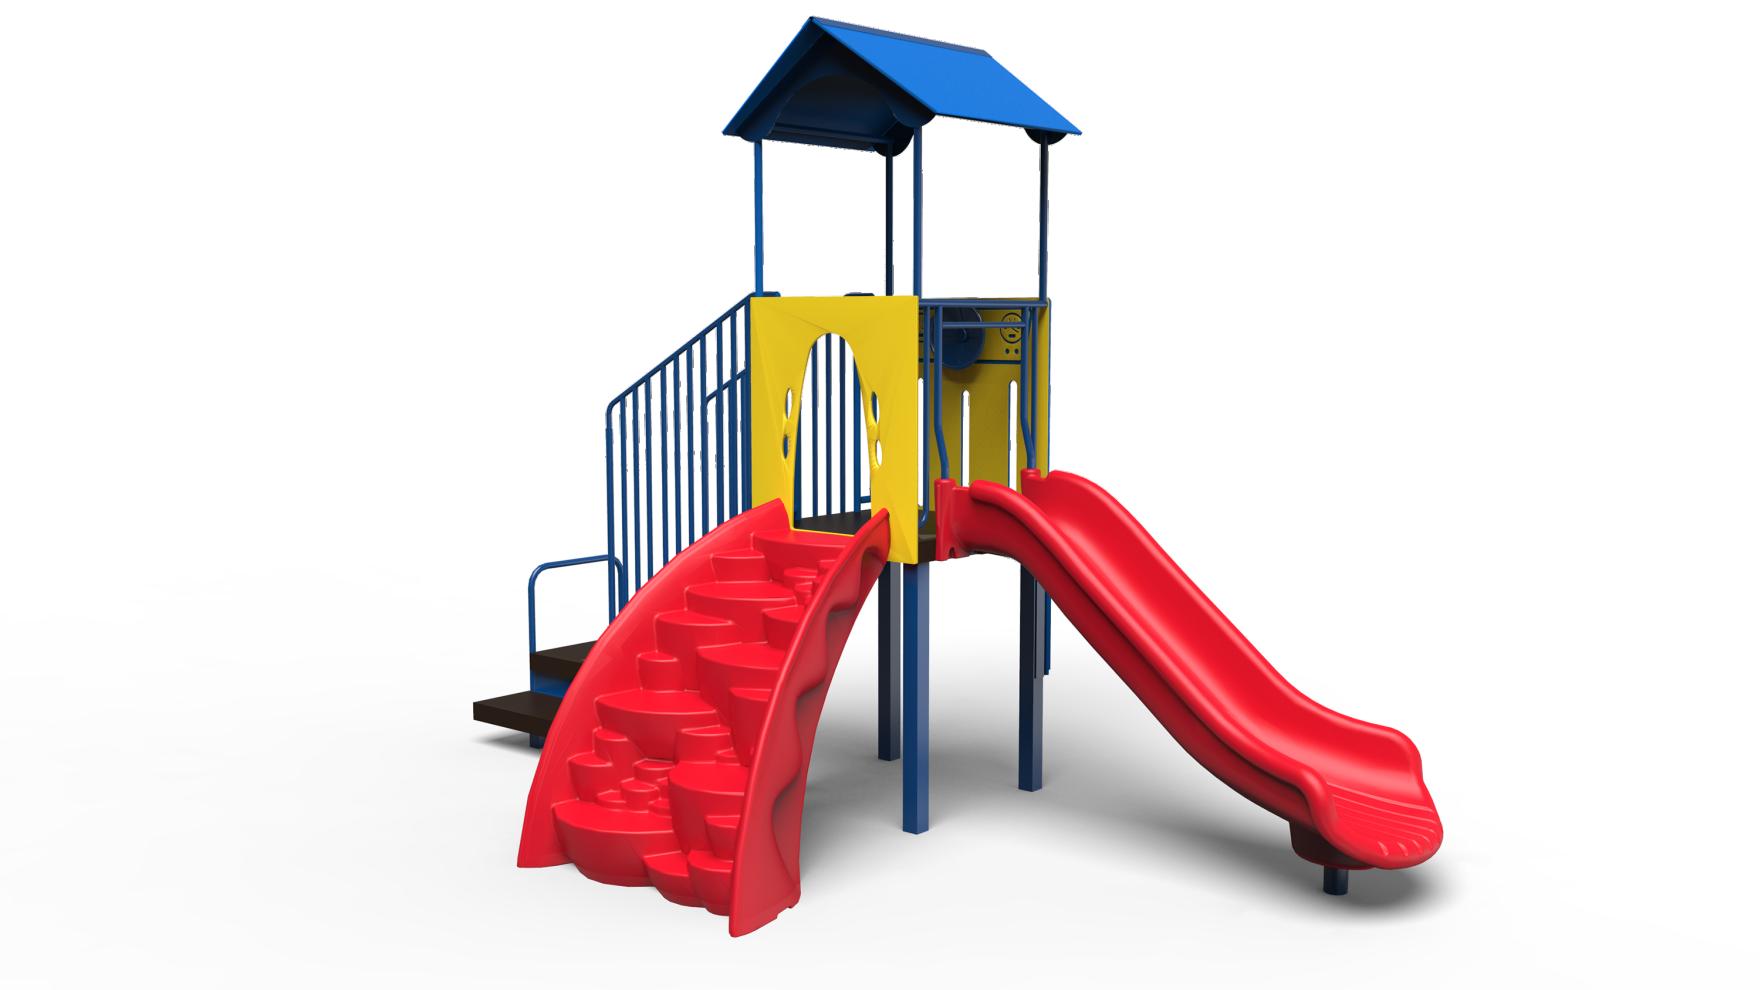 Playsimple mighty mountain web. Playground clipart playground fun